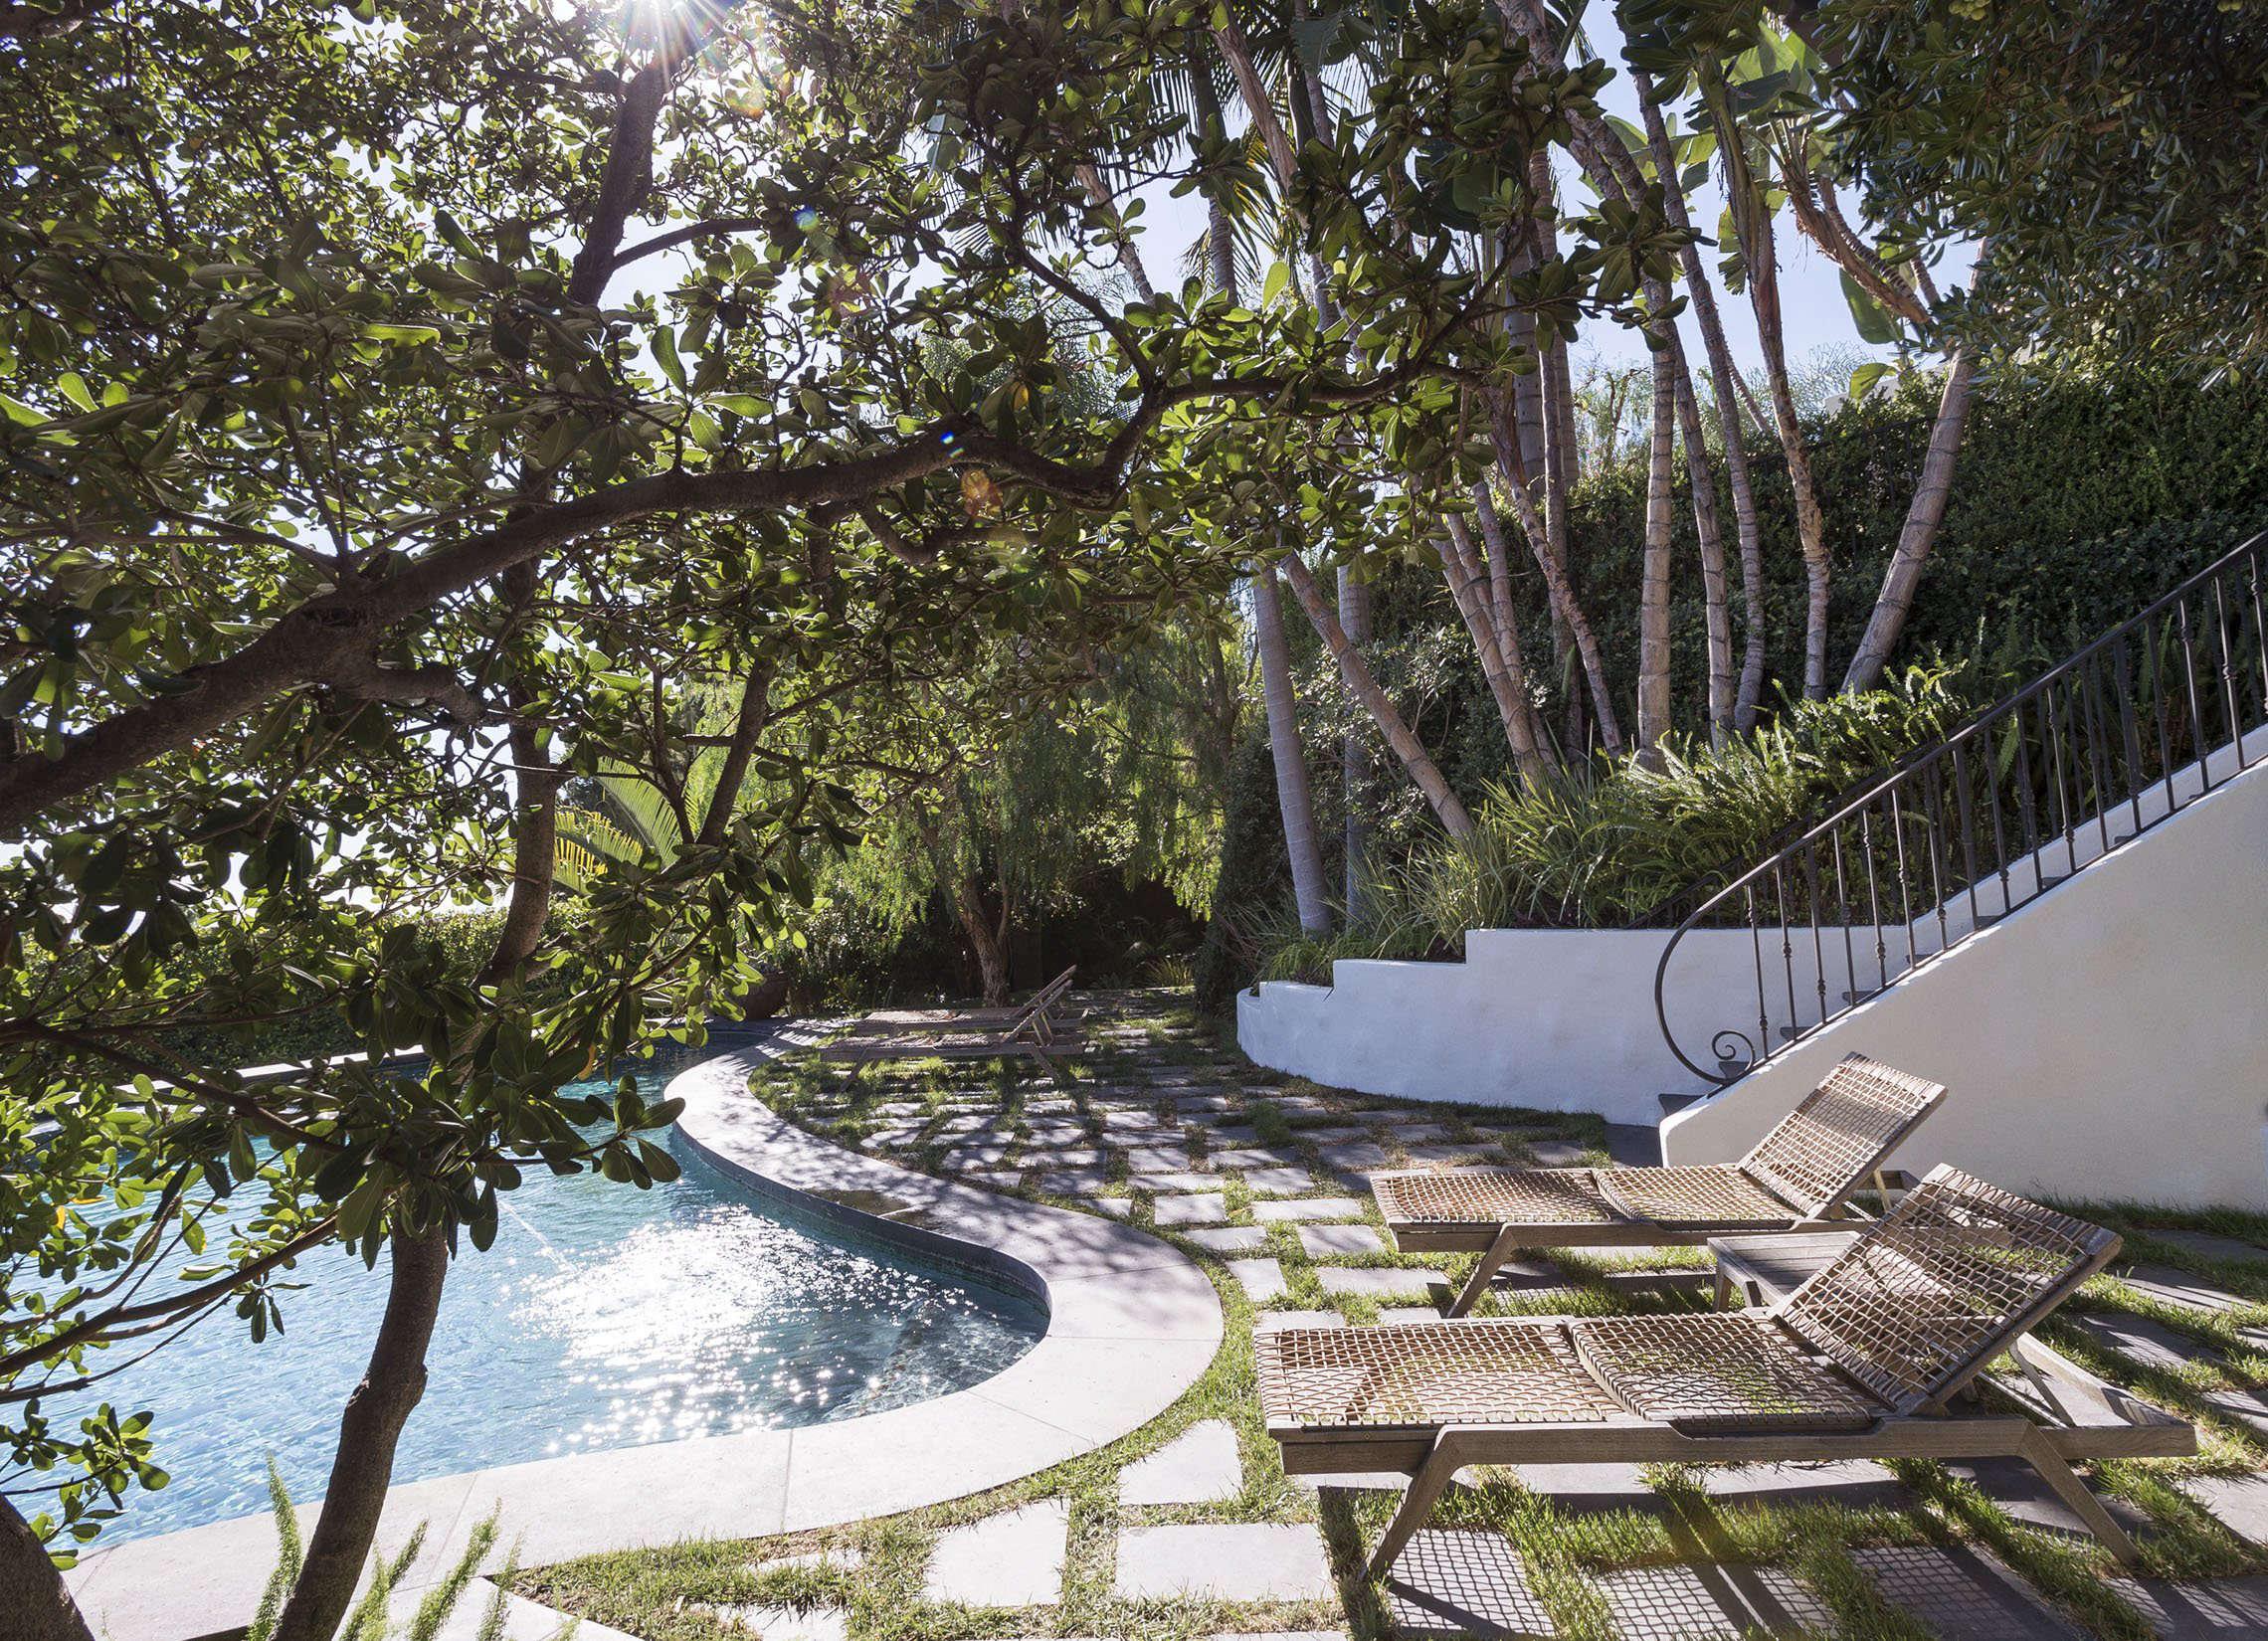 Landscape Ideas Garden Design For A Swimming Pool Area Gardenista